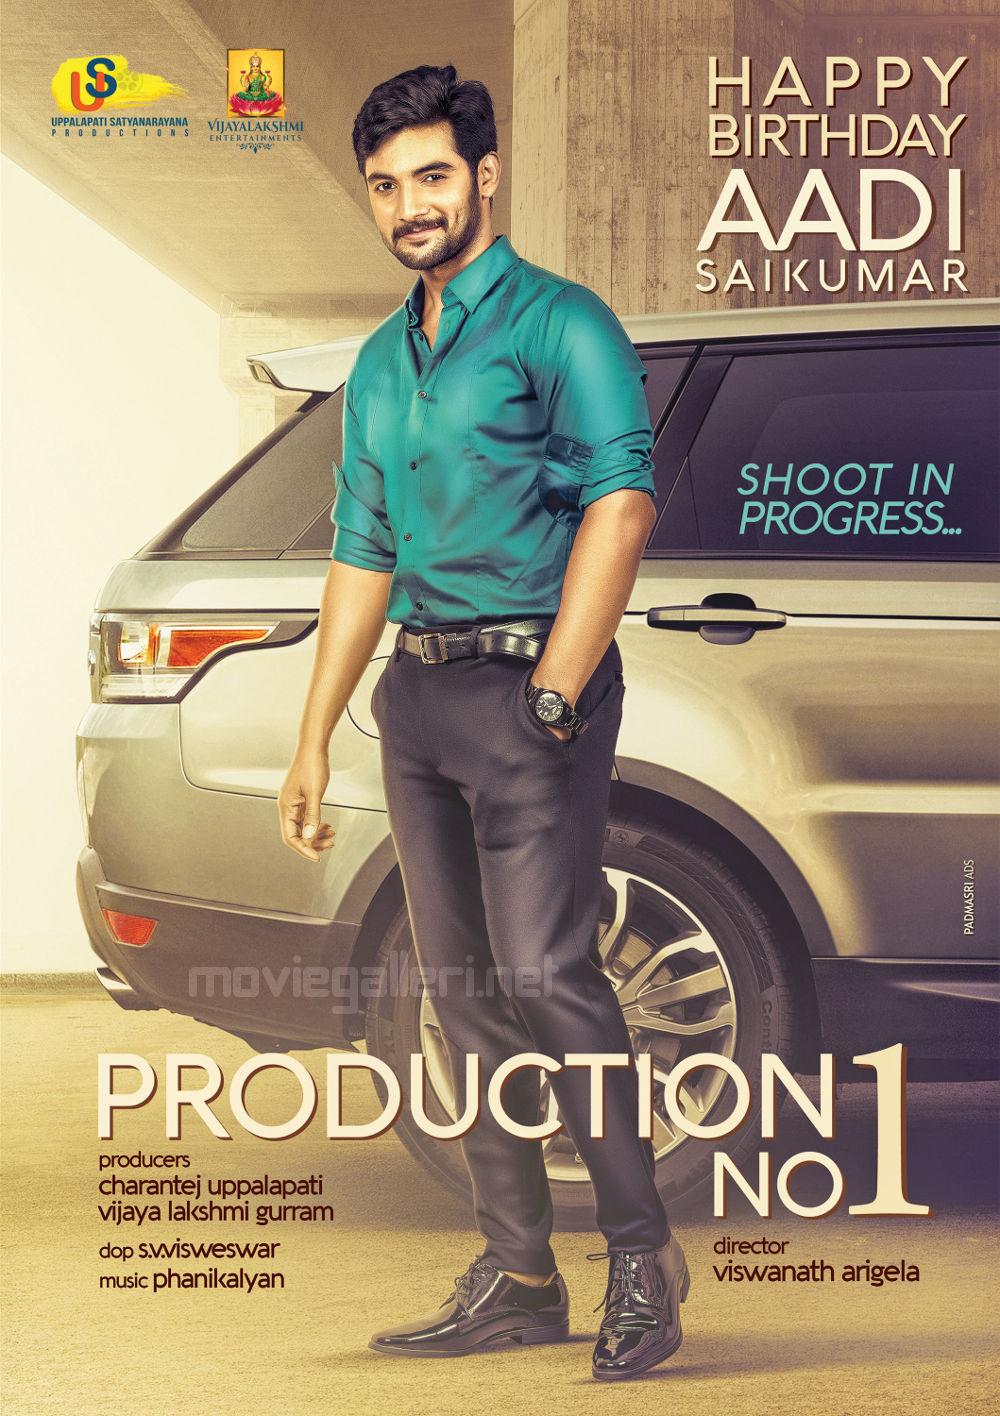 Vijyalakshmi Entertainments Production No 1 Aadi Birthday Poster